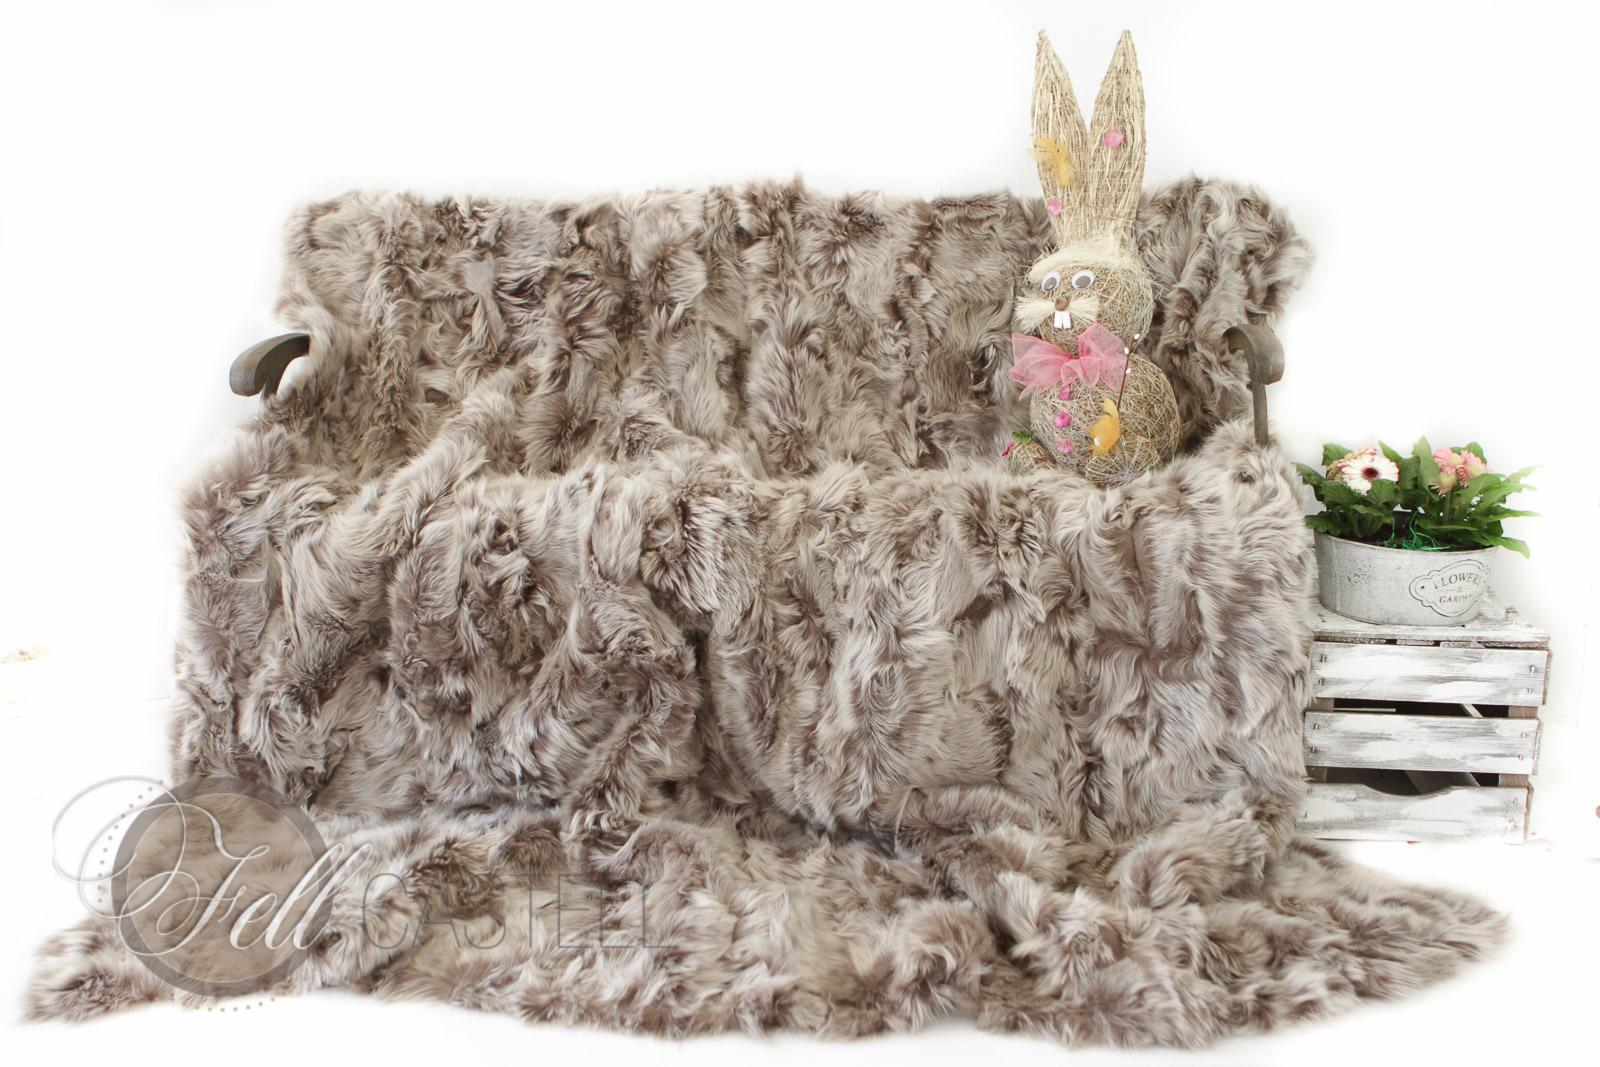 Toscana Lammfelldecke 200x200 cm Taupe mit Snow Tops abgefüttert Patchwork